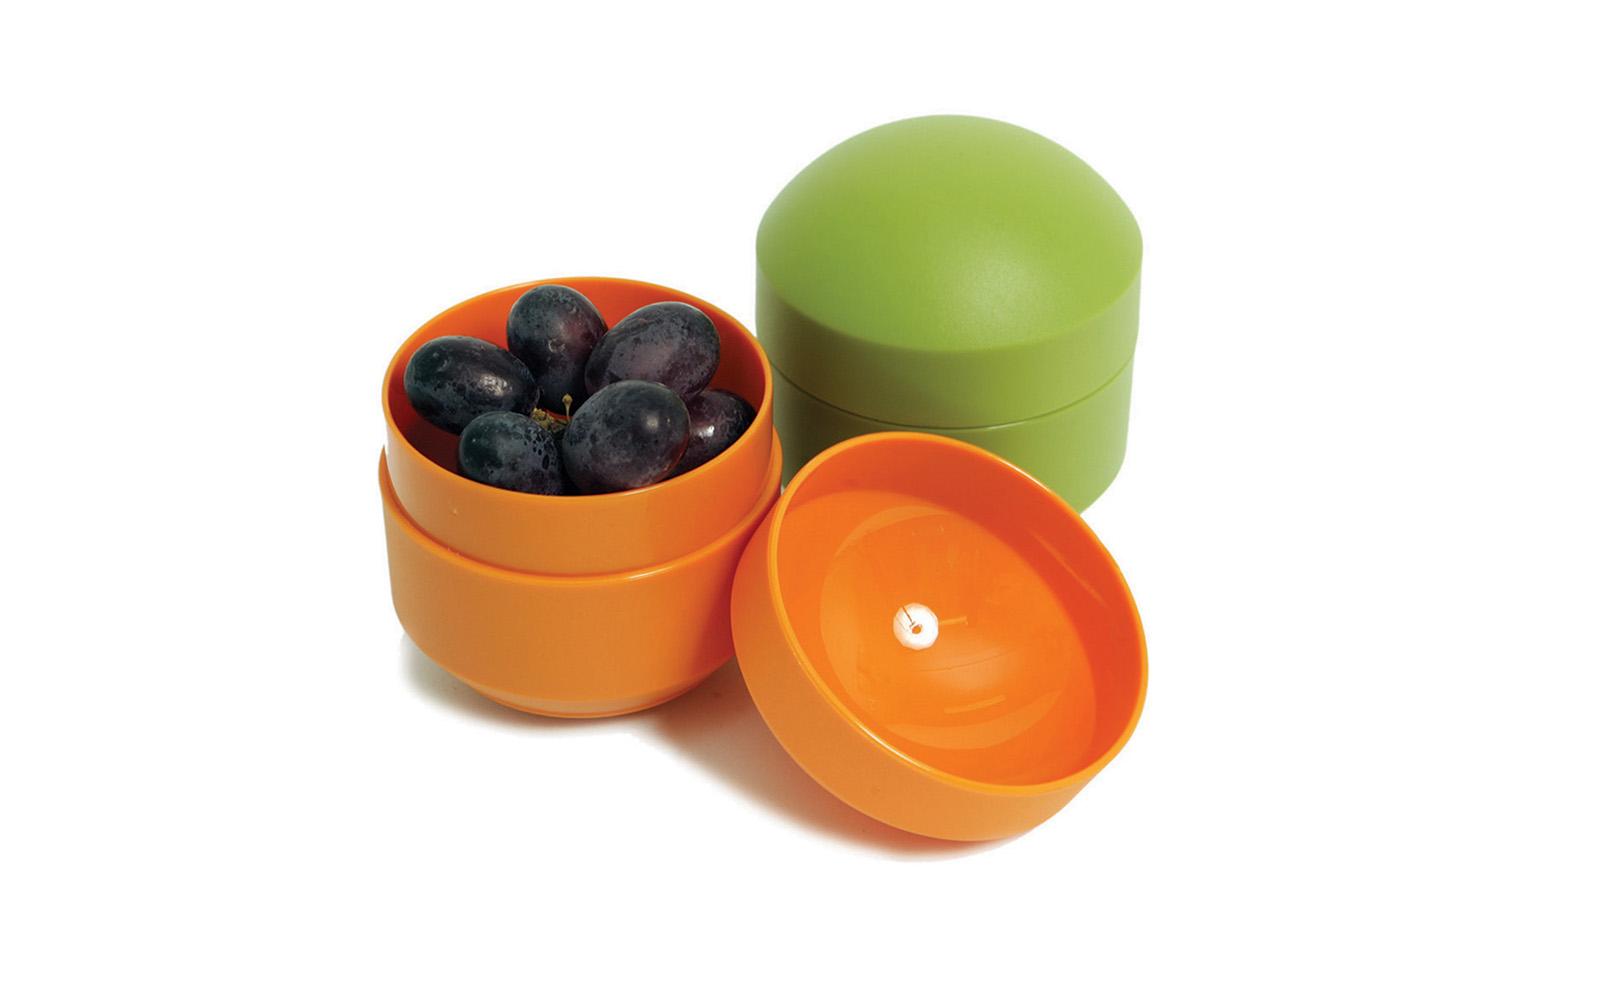 lunchbox-pots-1600